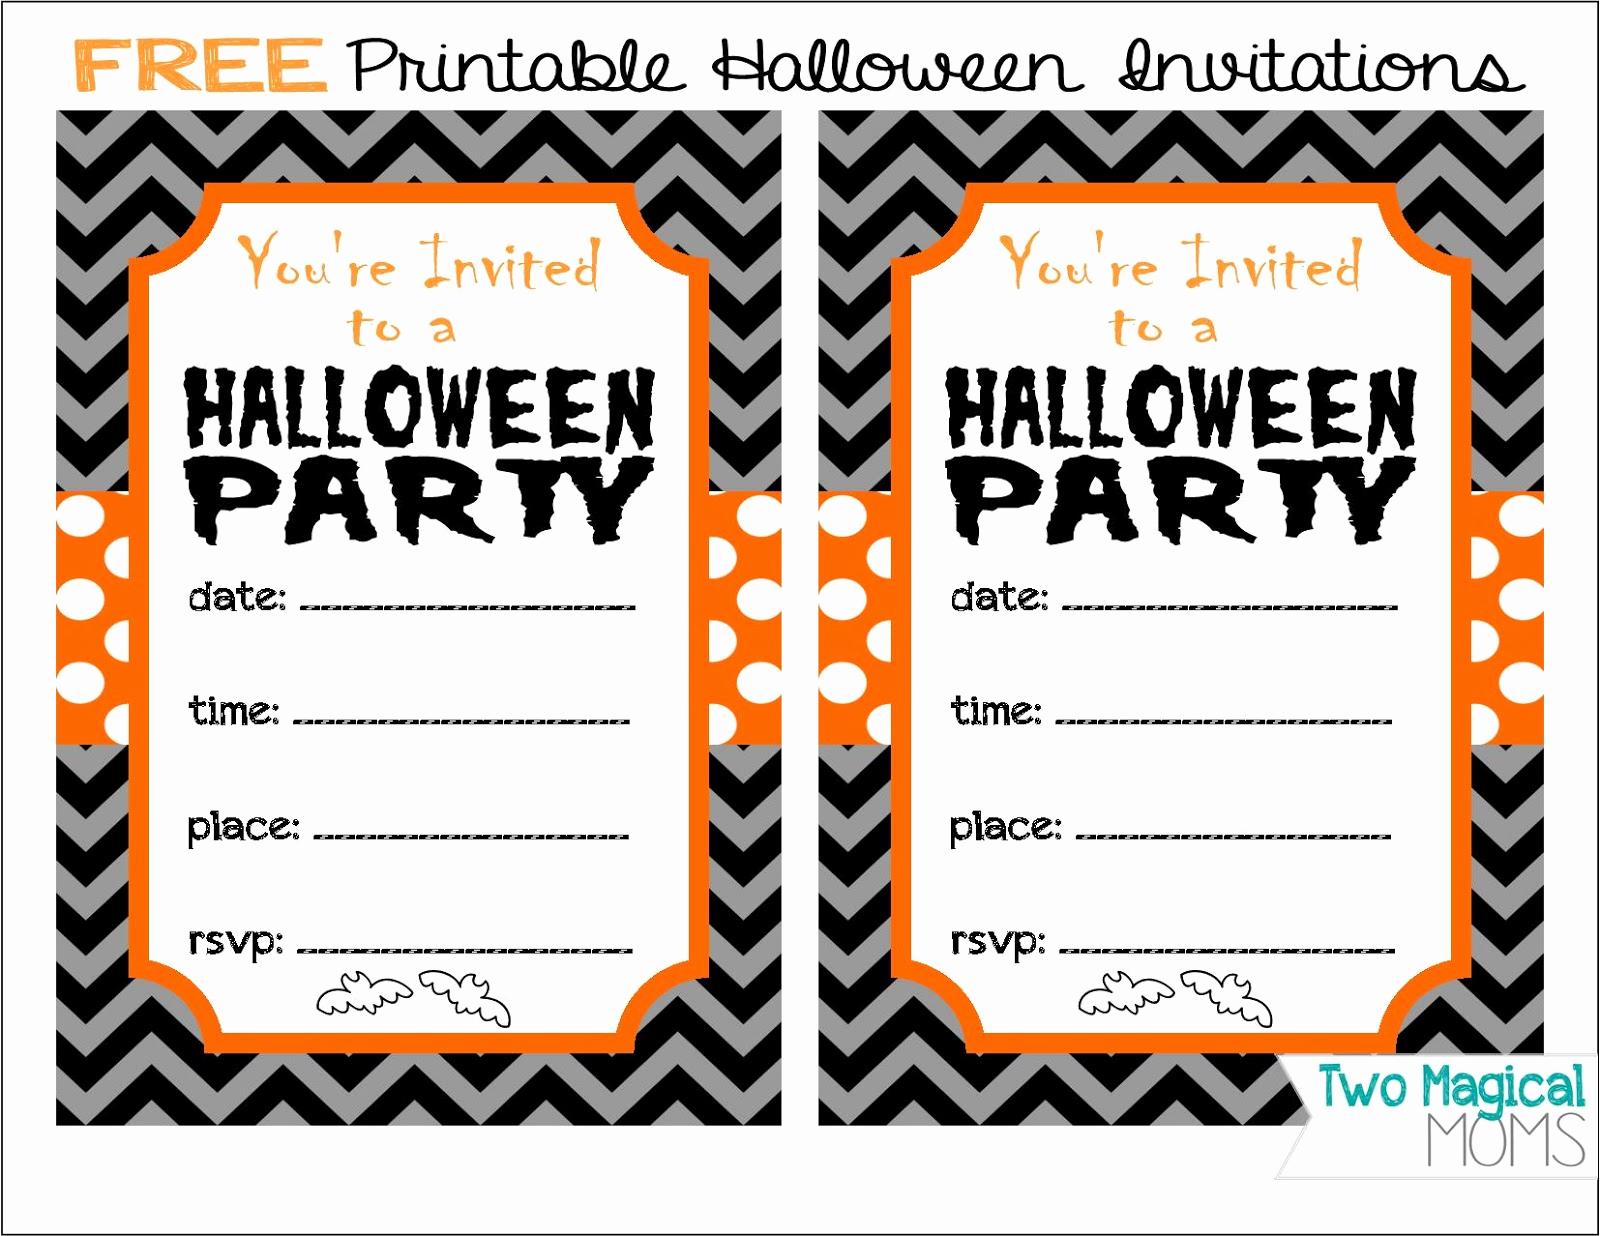 Free Halloween Invitation Printable Fresh Two Magical Moms Free Printable Halloween Invitations